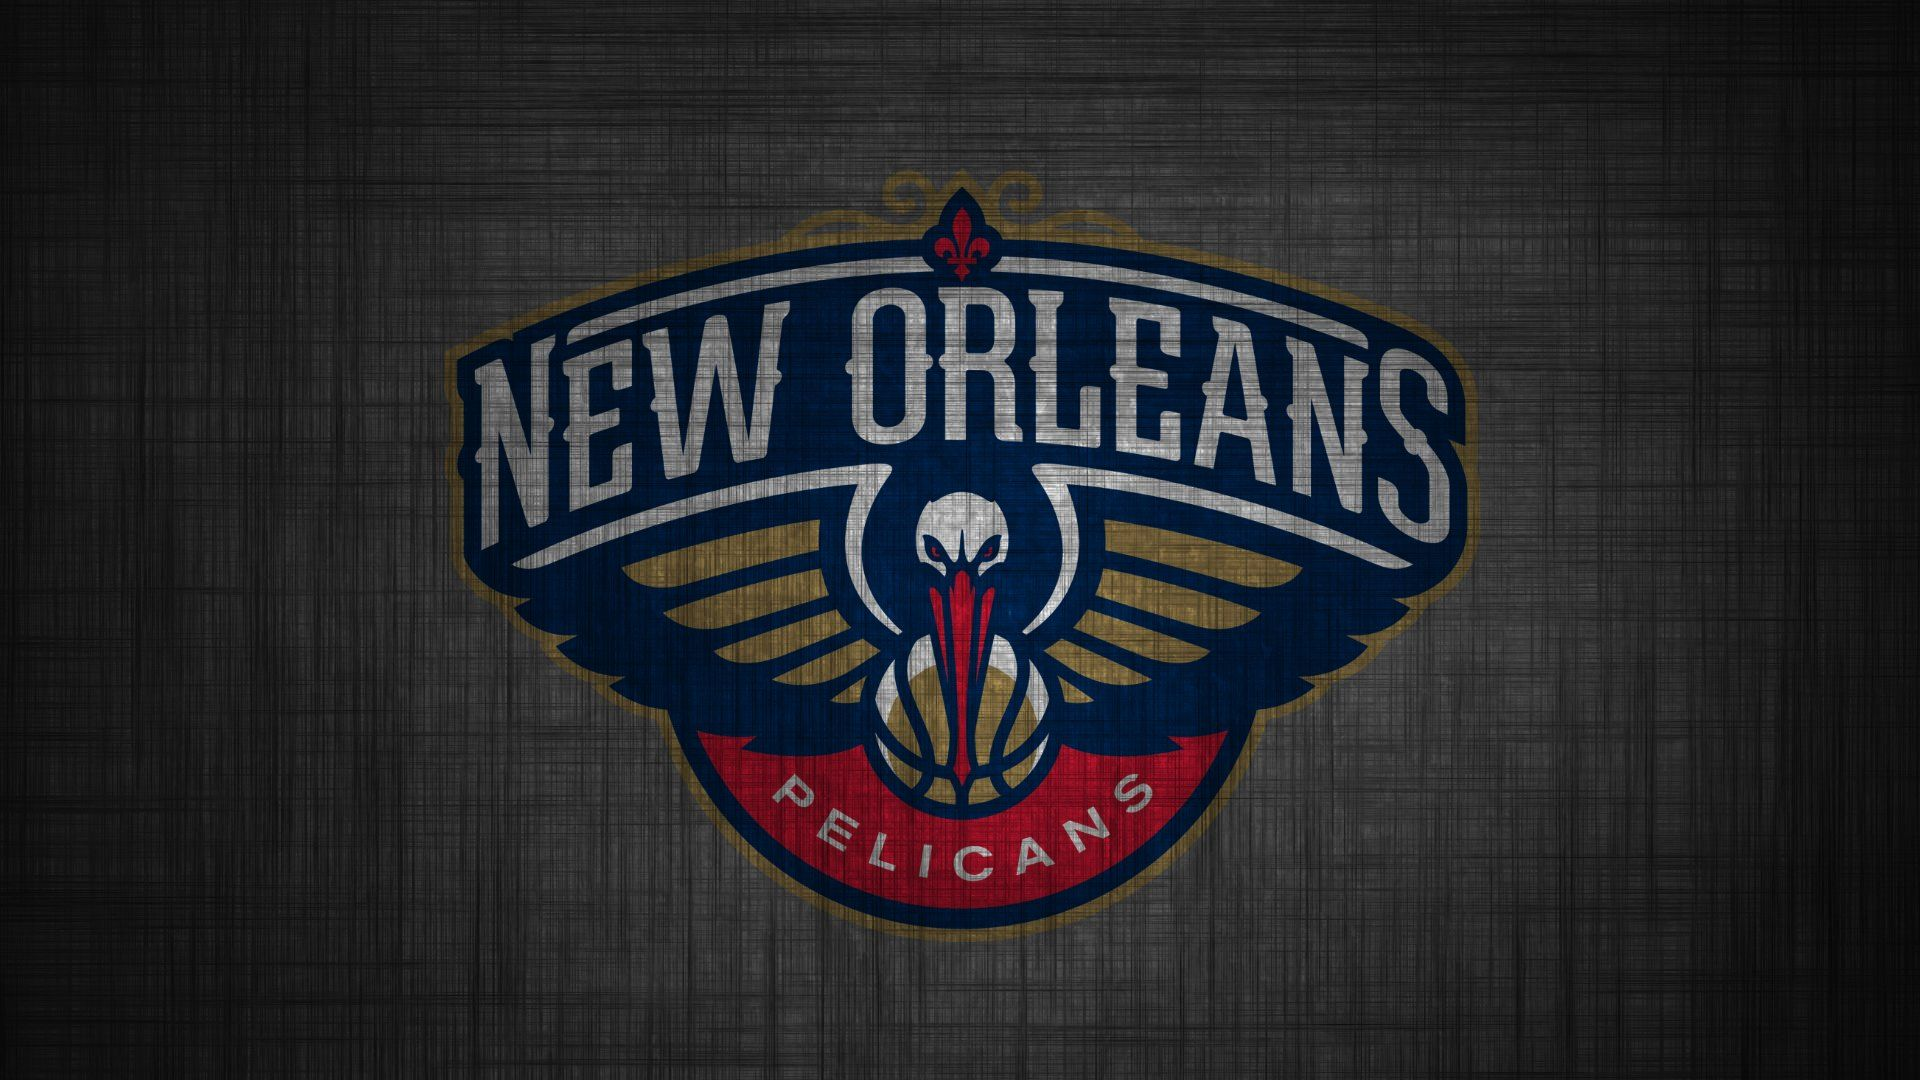 New Orleans Pelicans Wallpaper #1 | New Orleans Hornets/Pelicans